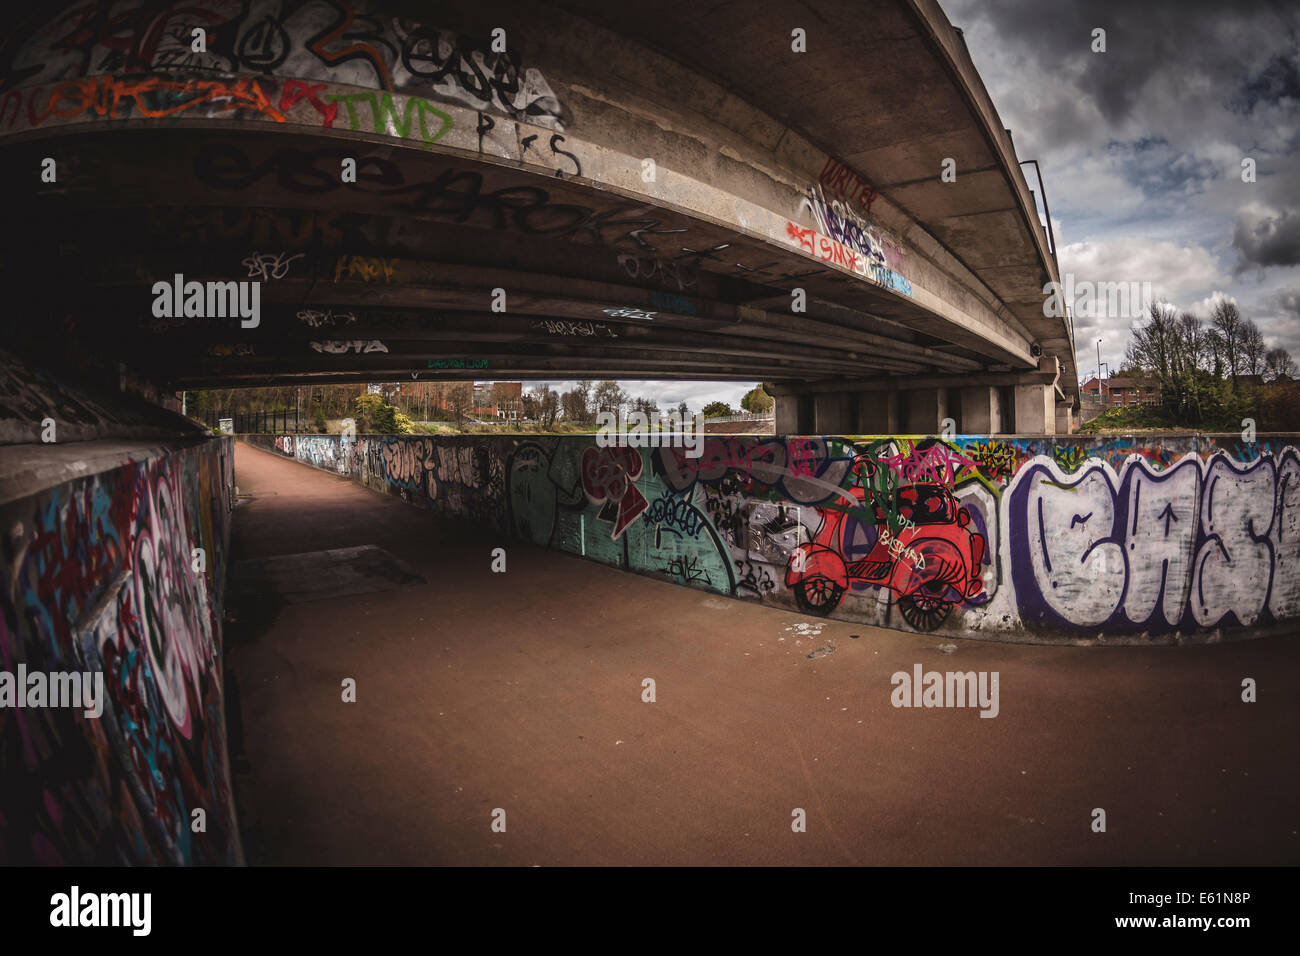 Graffiti street art under road bridge. - Stock Image